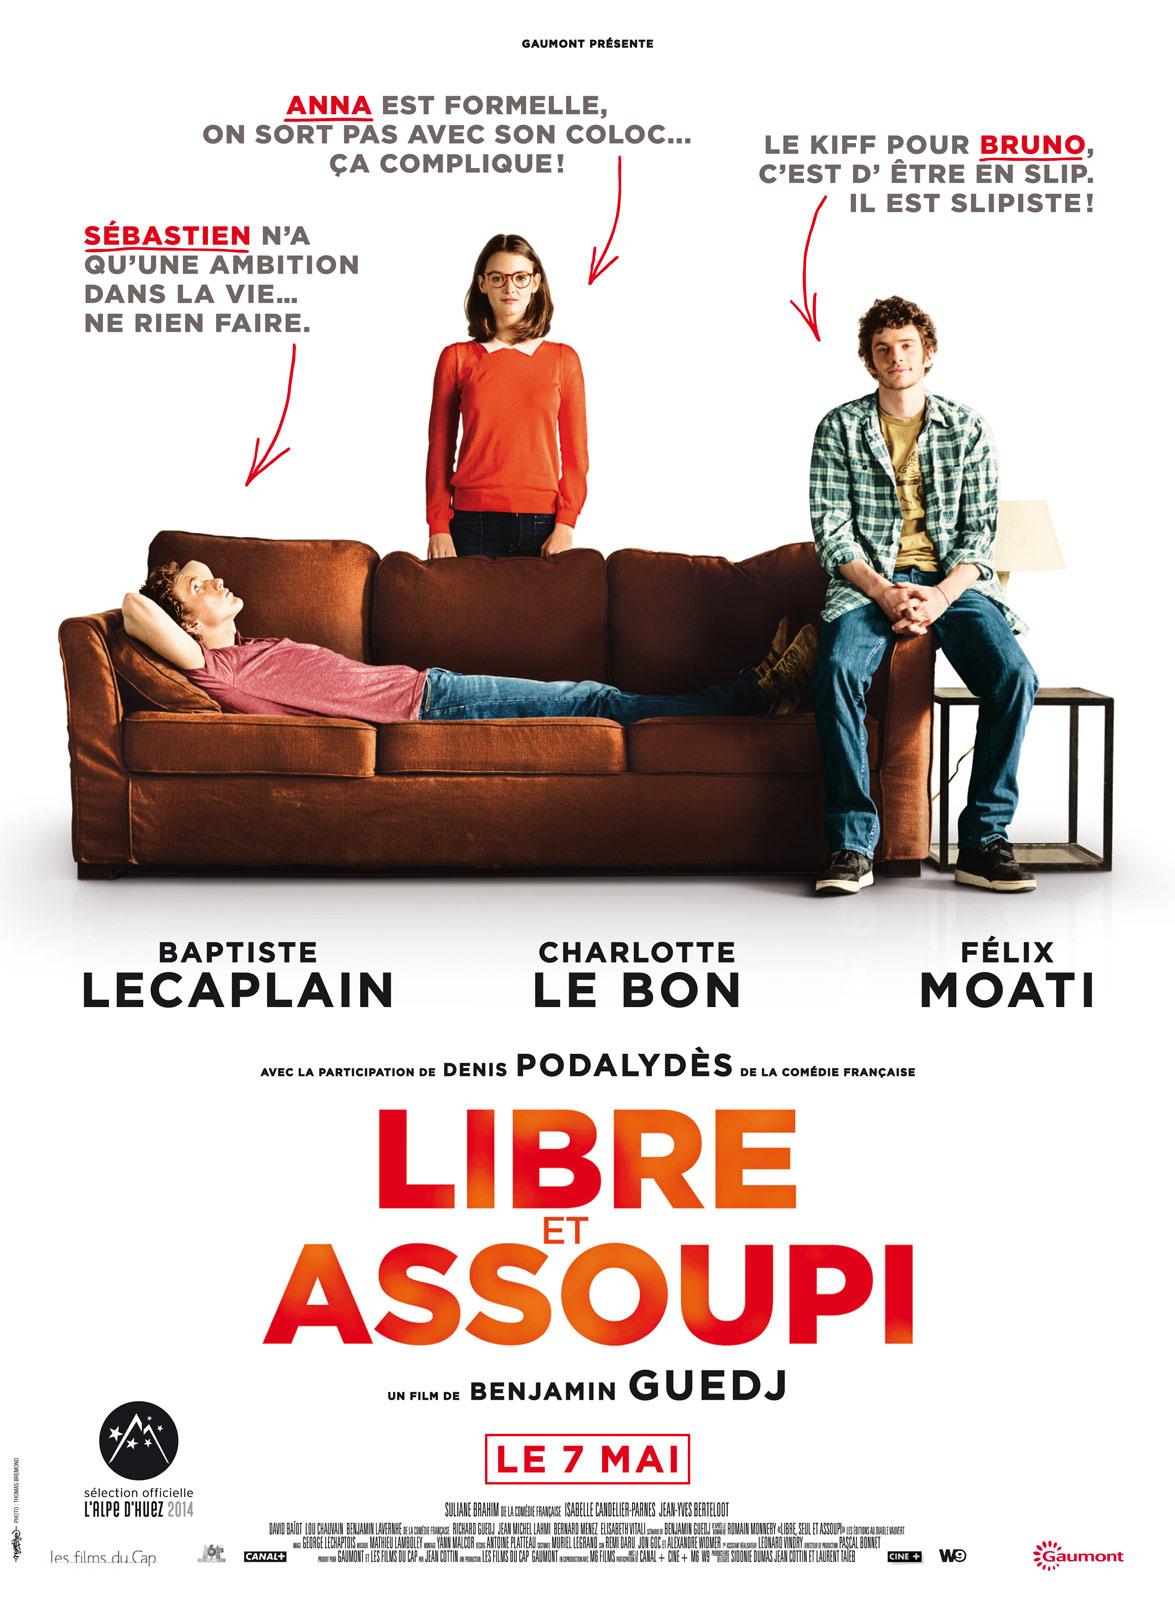 http://fr.web.img1.acsta.net/pictures/14/02/26/17/13/523960.jpg